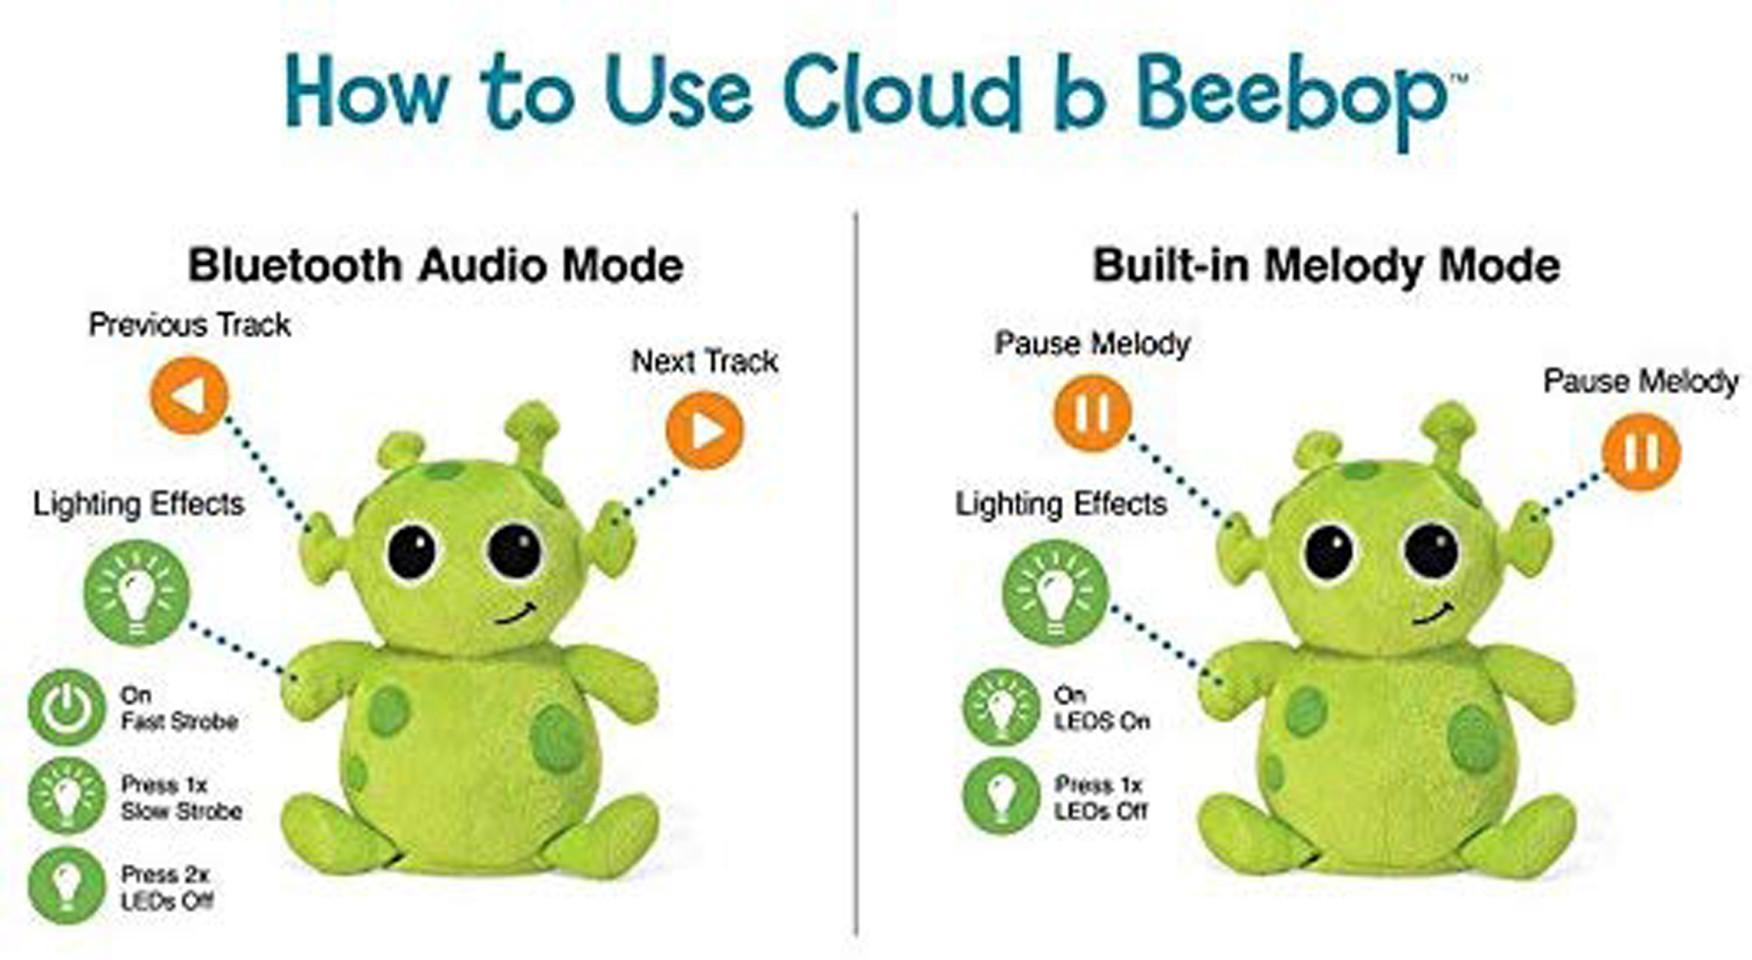 cloud b Beebop Bluetooth